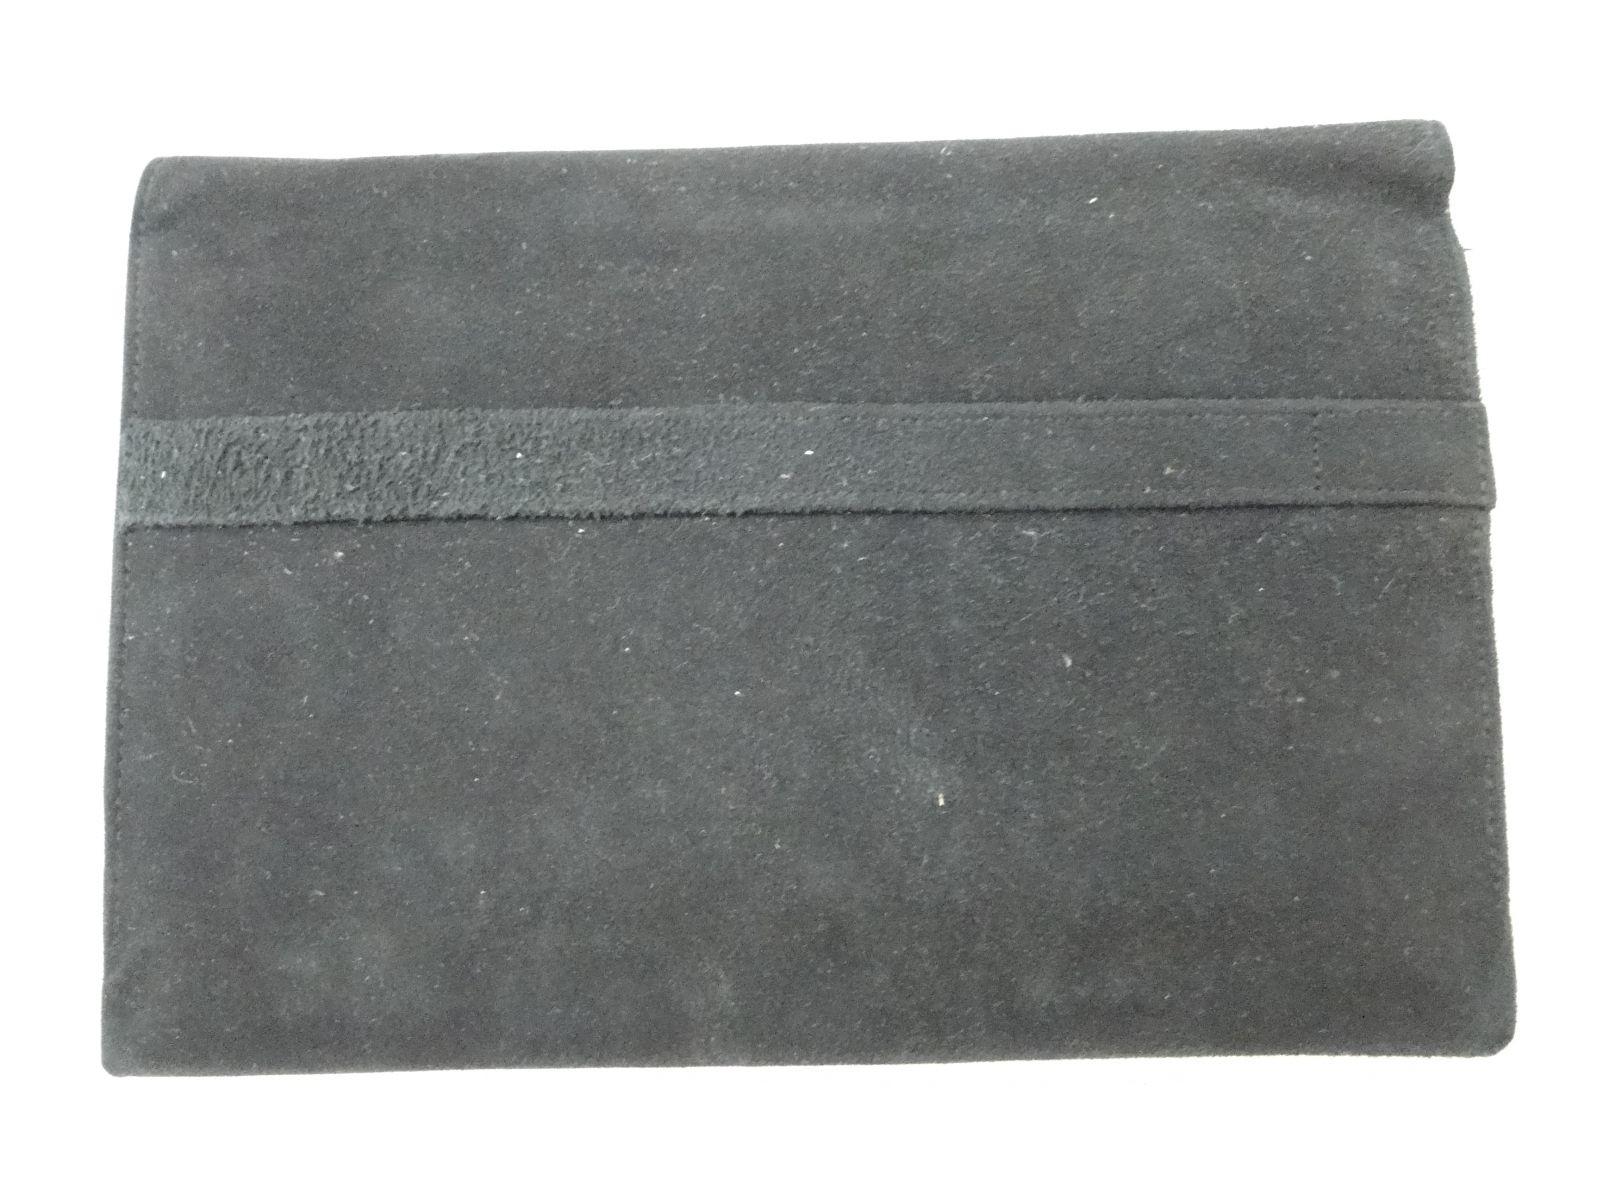 DSC08800.JPG (1600�1200)